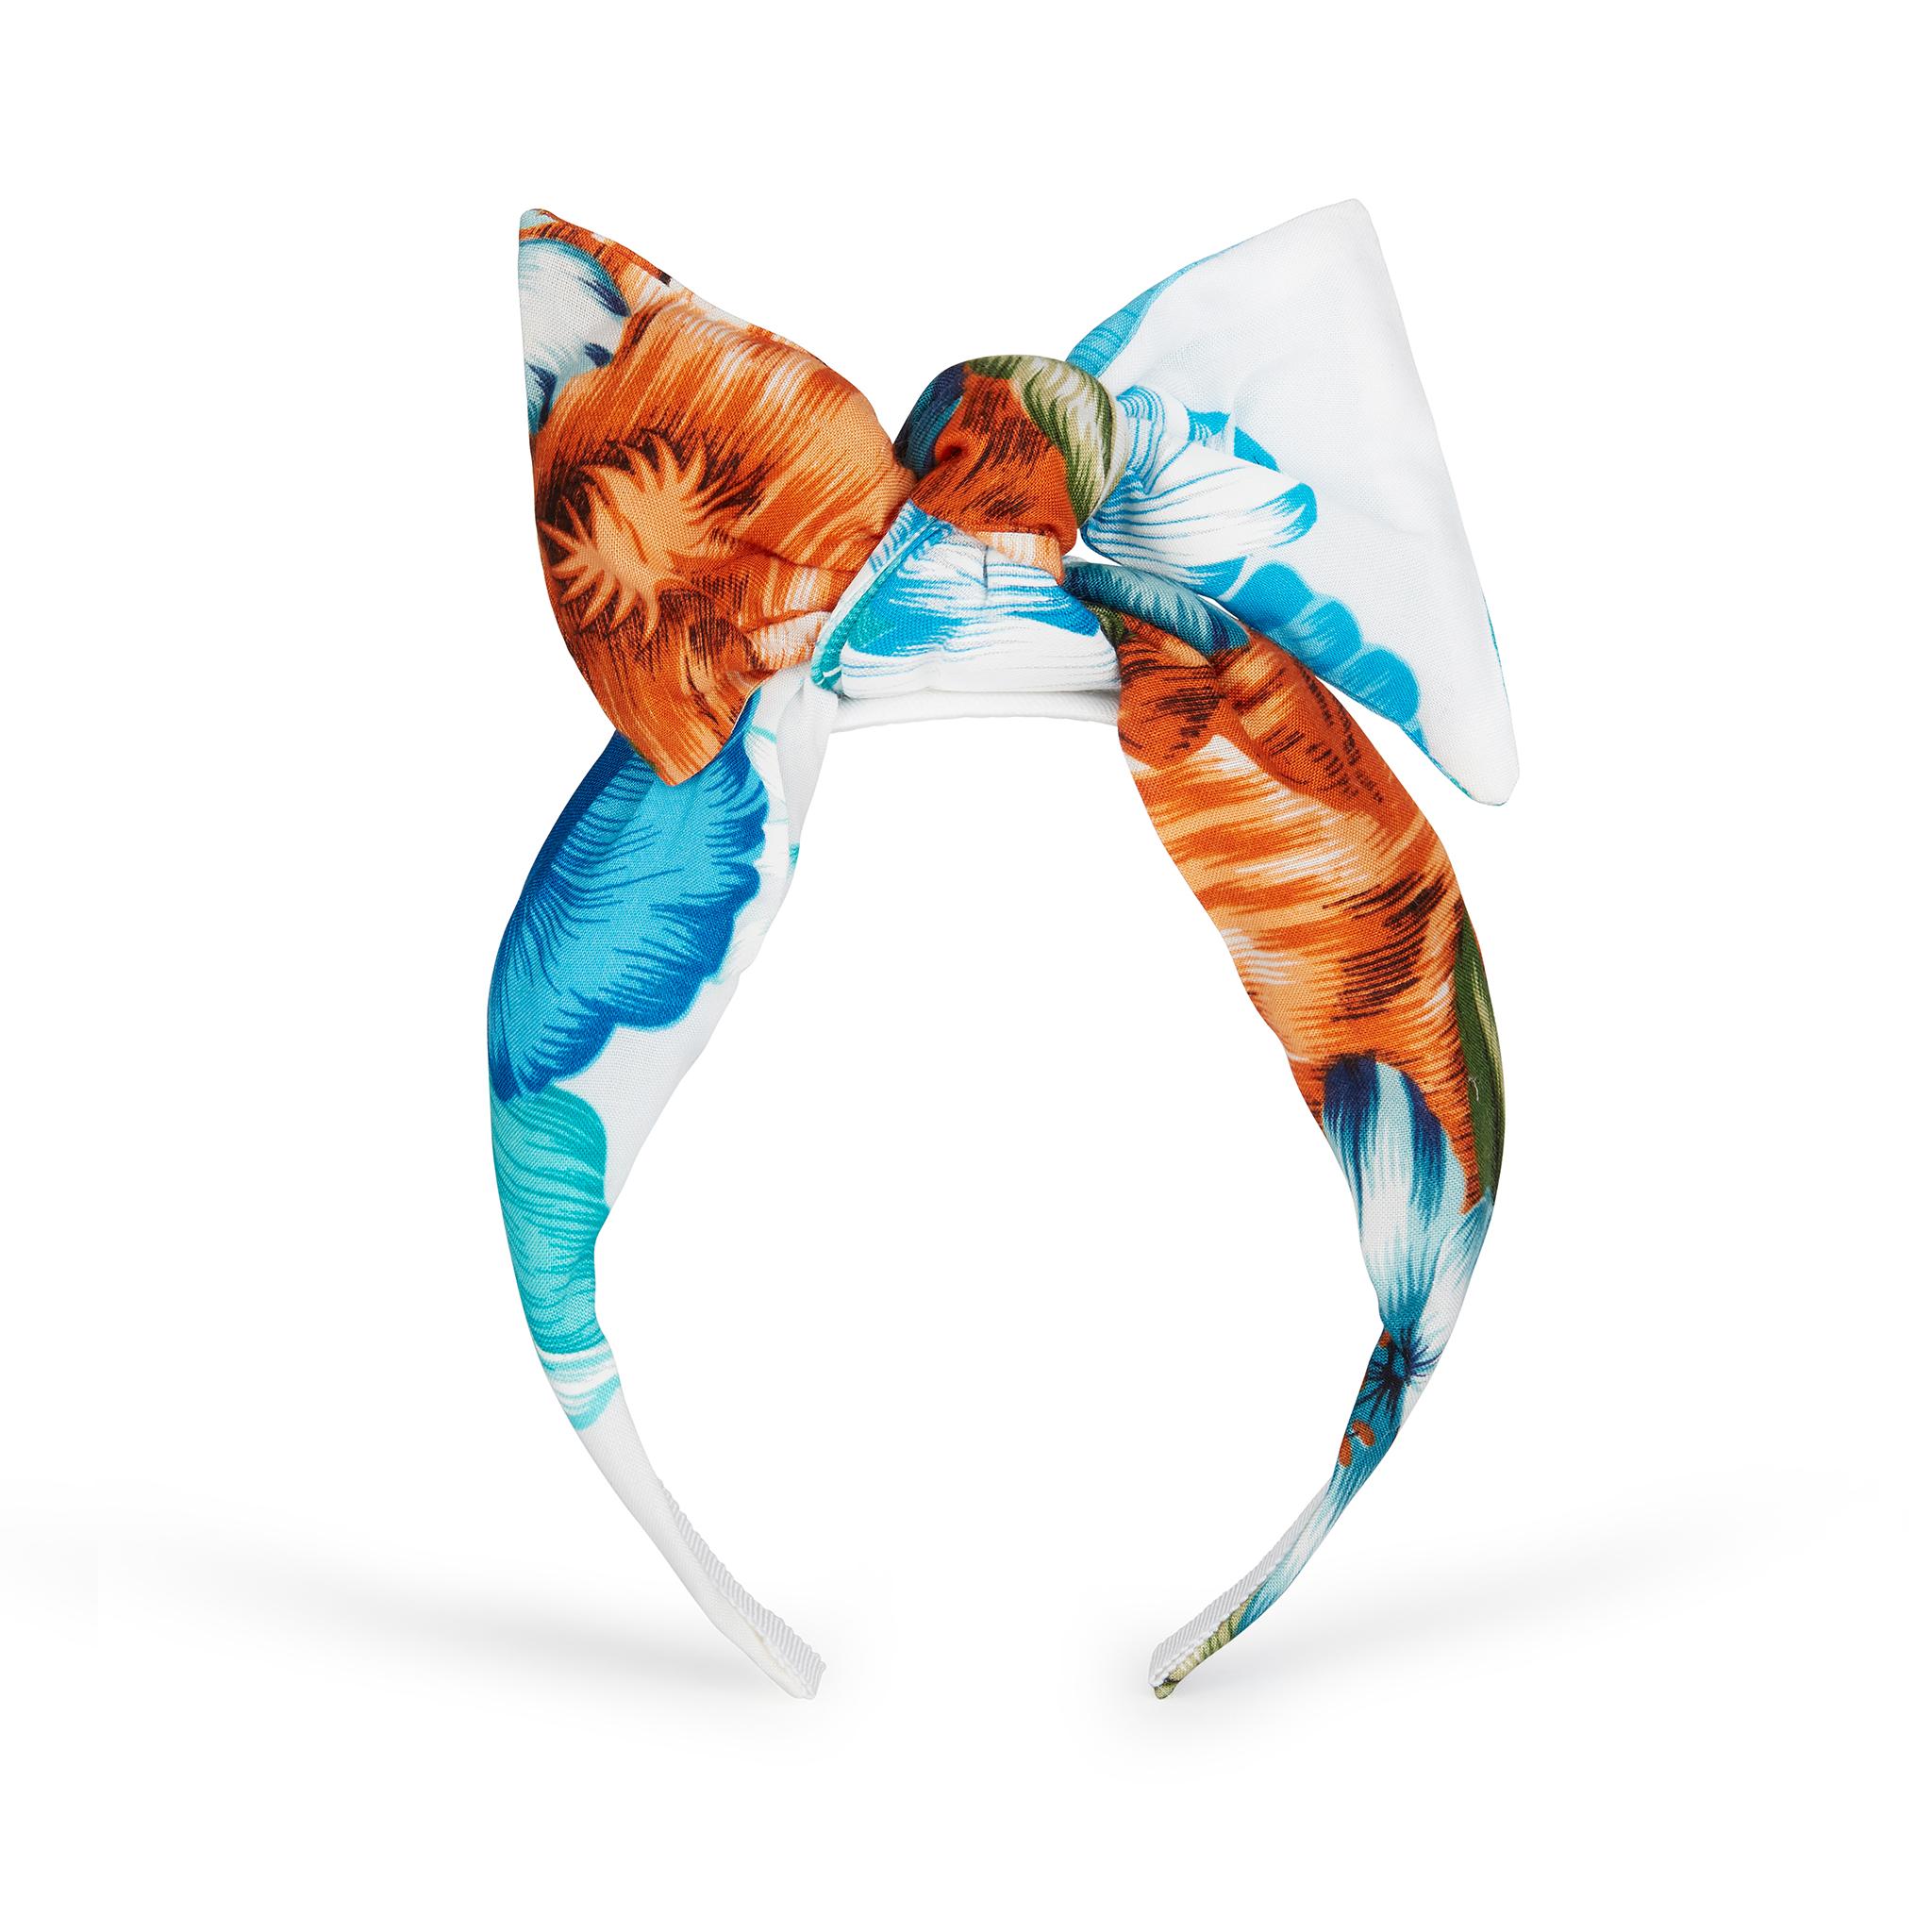 Benoit-headbands-_01.jpg